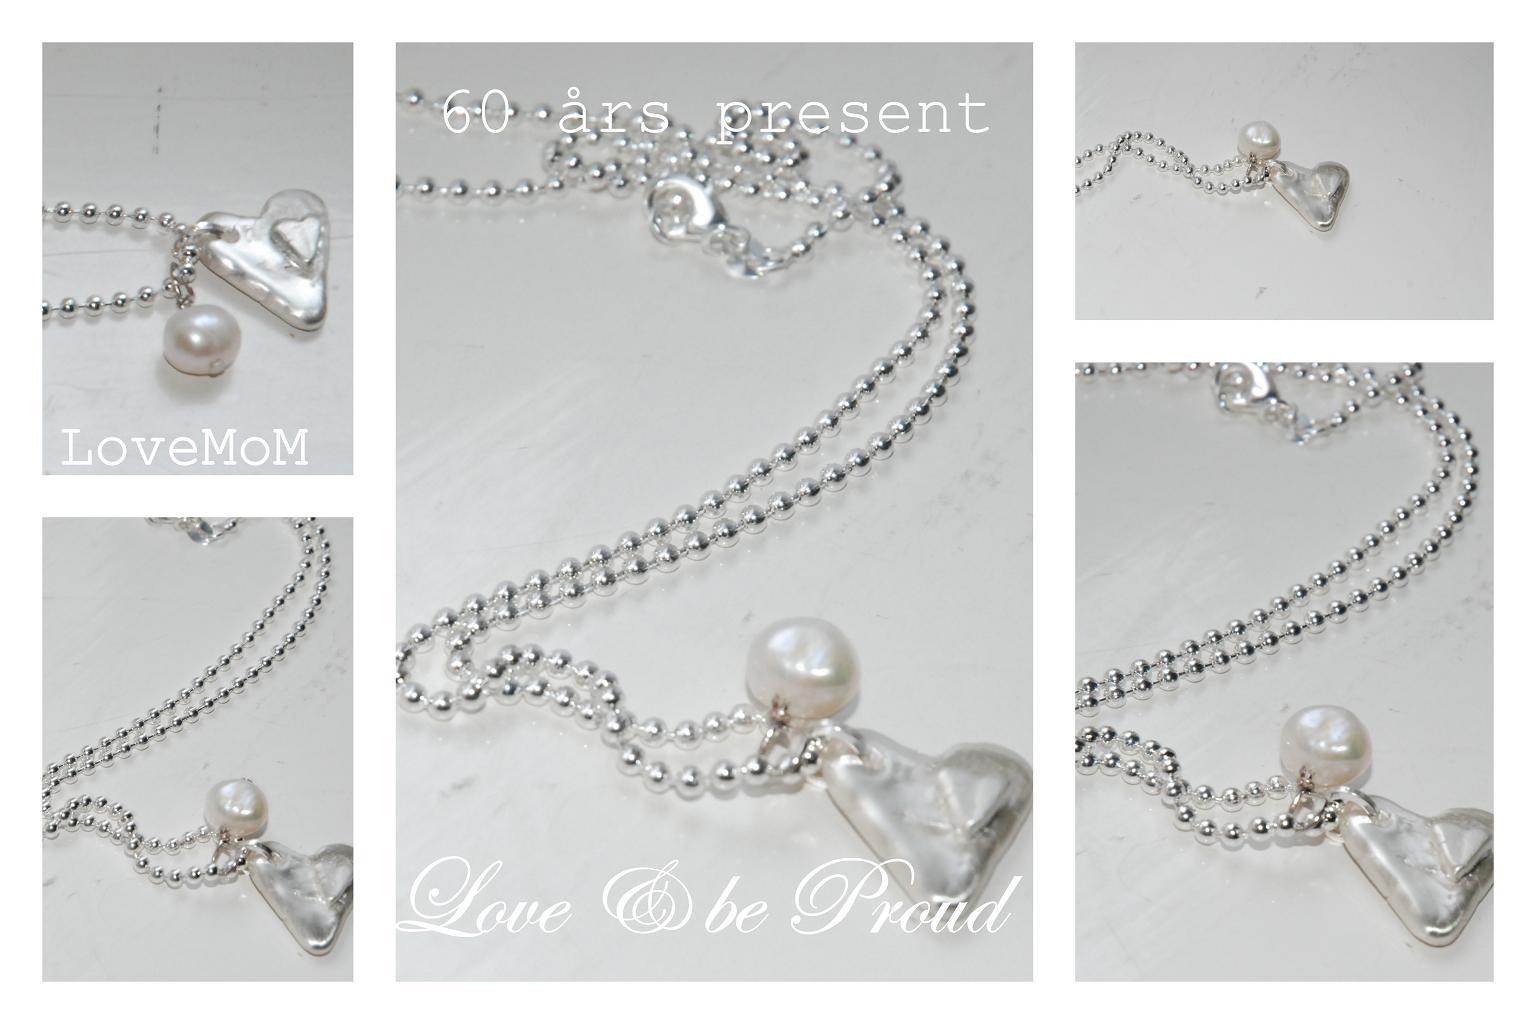 designa ditt eget smycke online